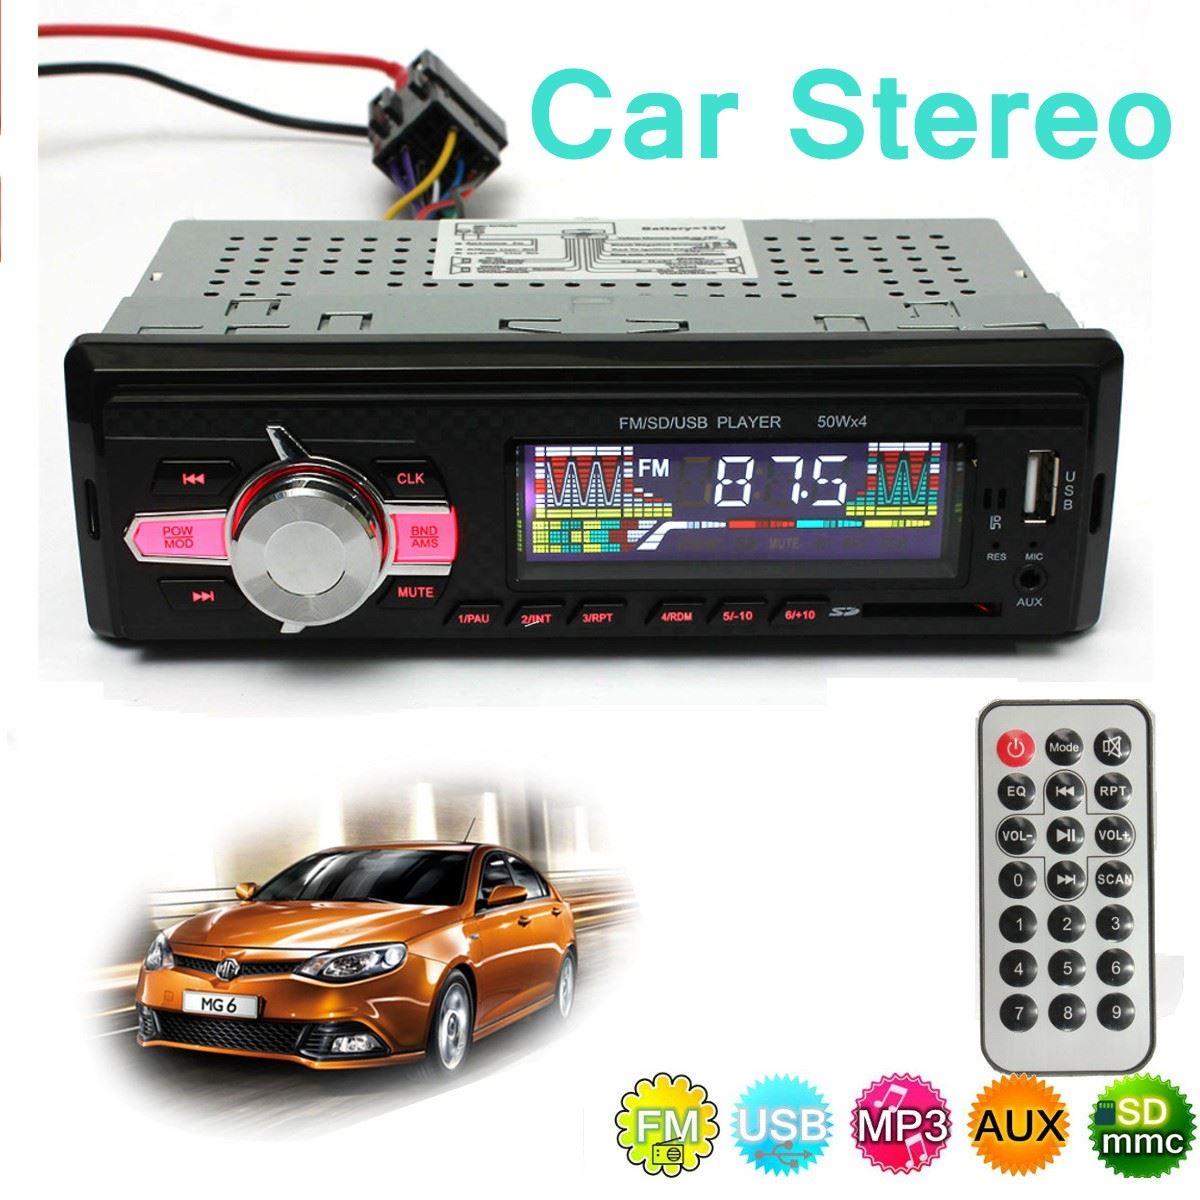 Car Auto Stereo LCD Audio Headunit Radio In Dash 12V DC SD FM USB MP3 Player AUX(China (Mainland))